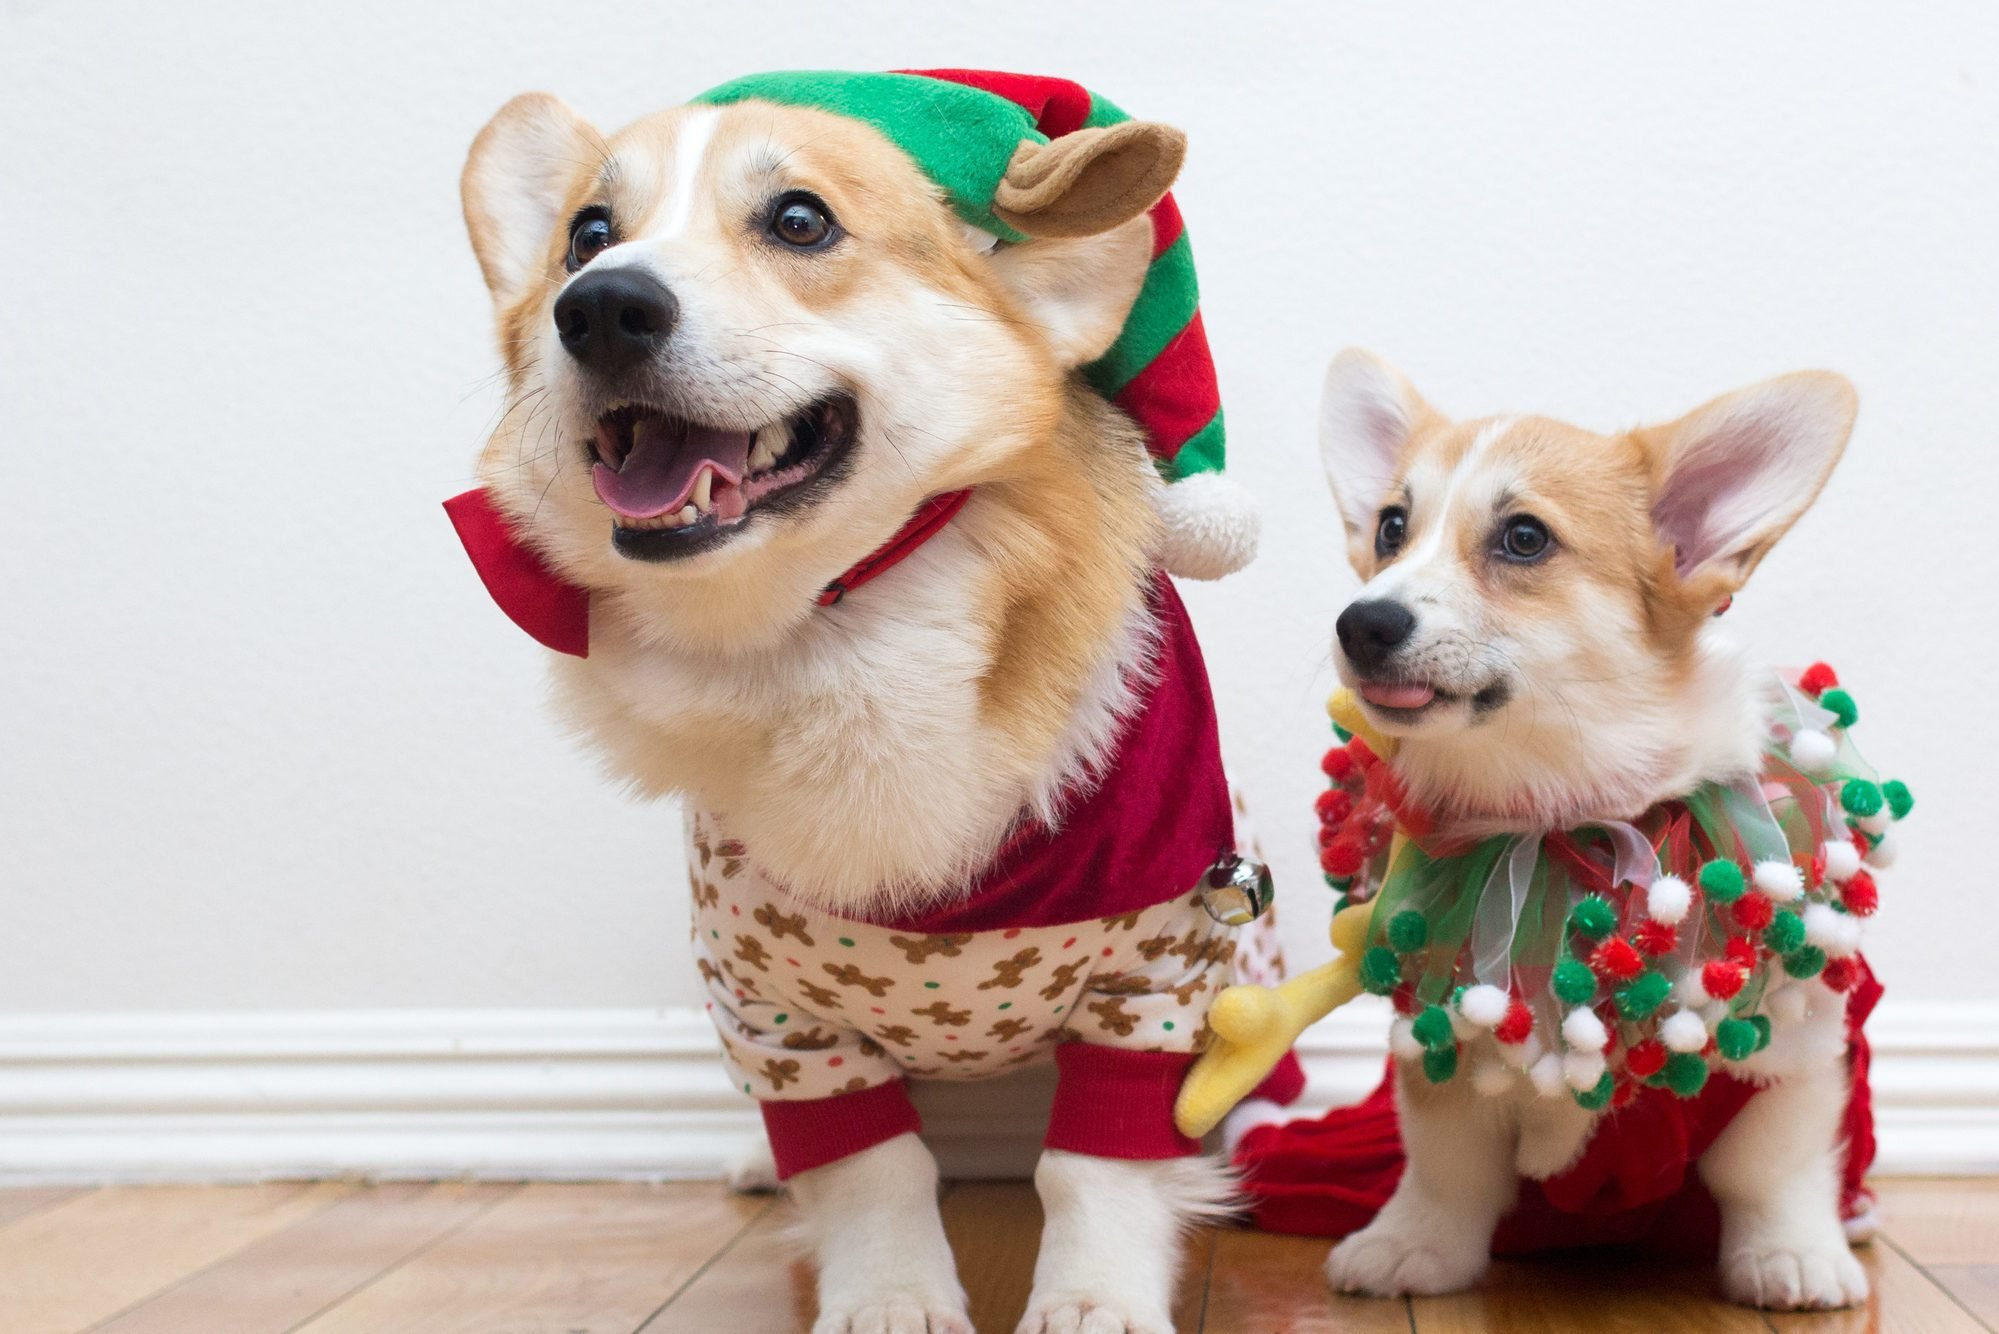 Corgi dogs wearing festive Christmas clothes